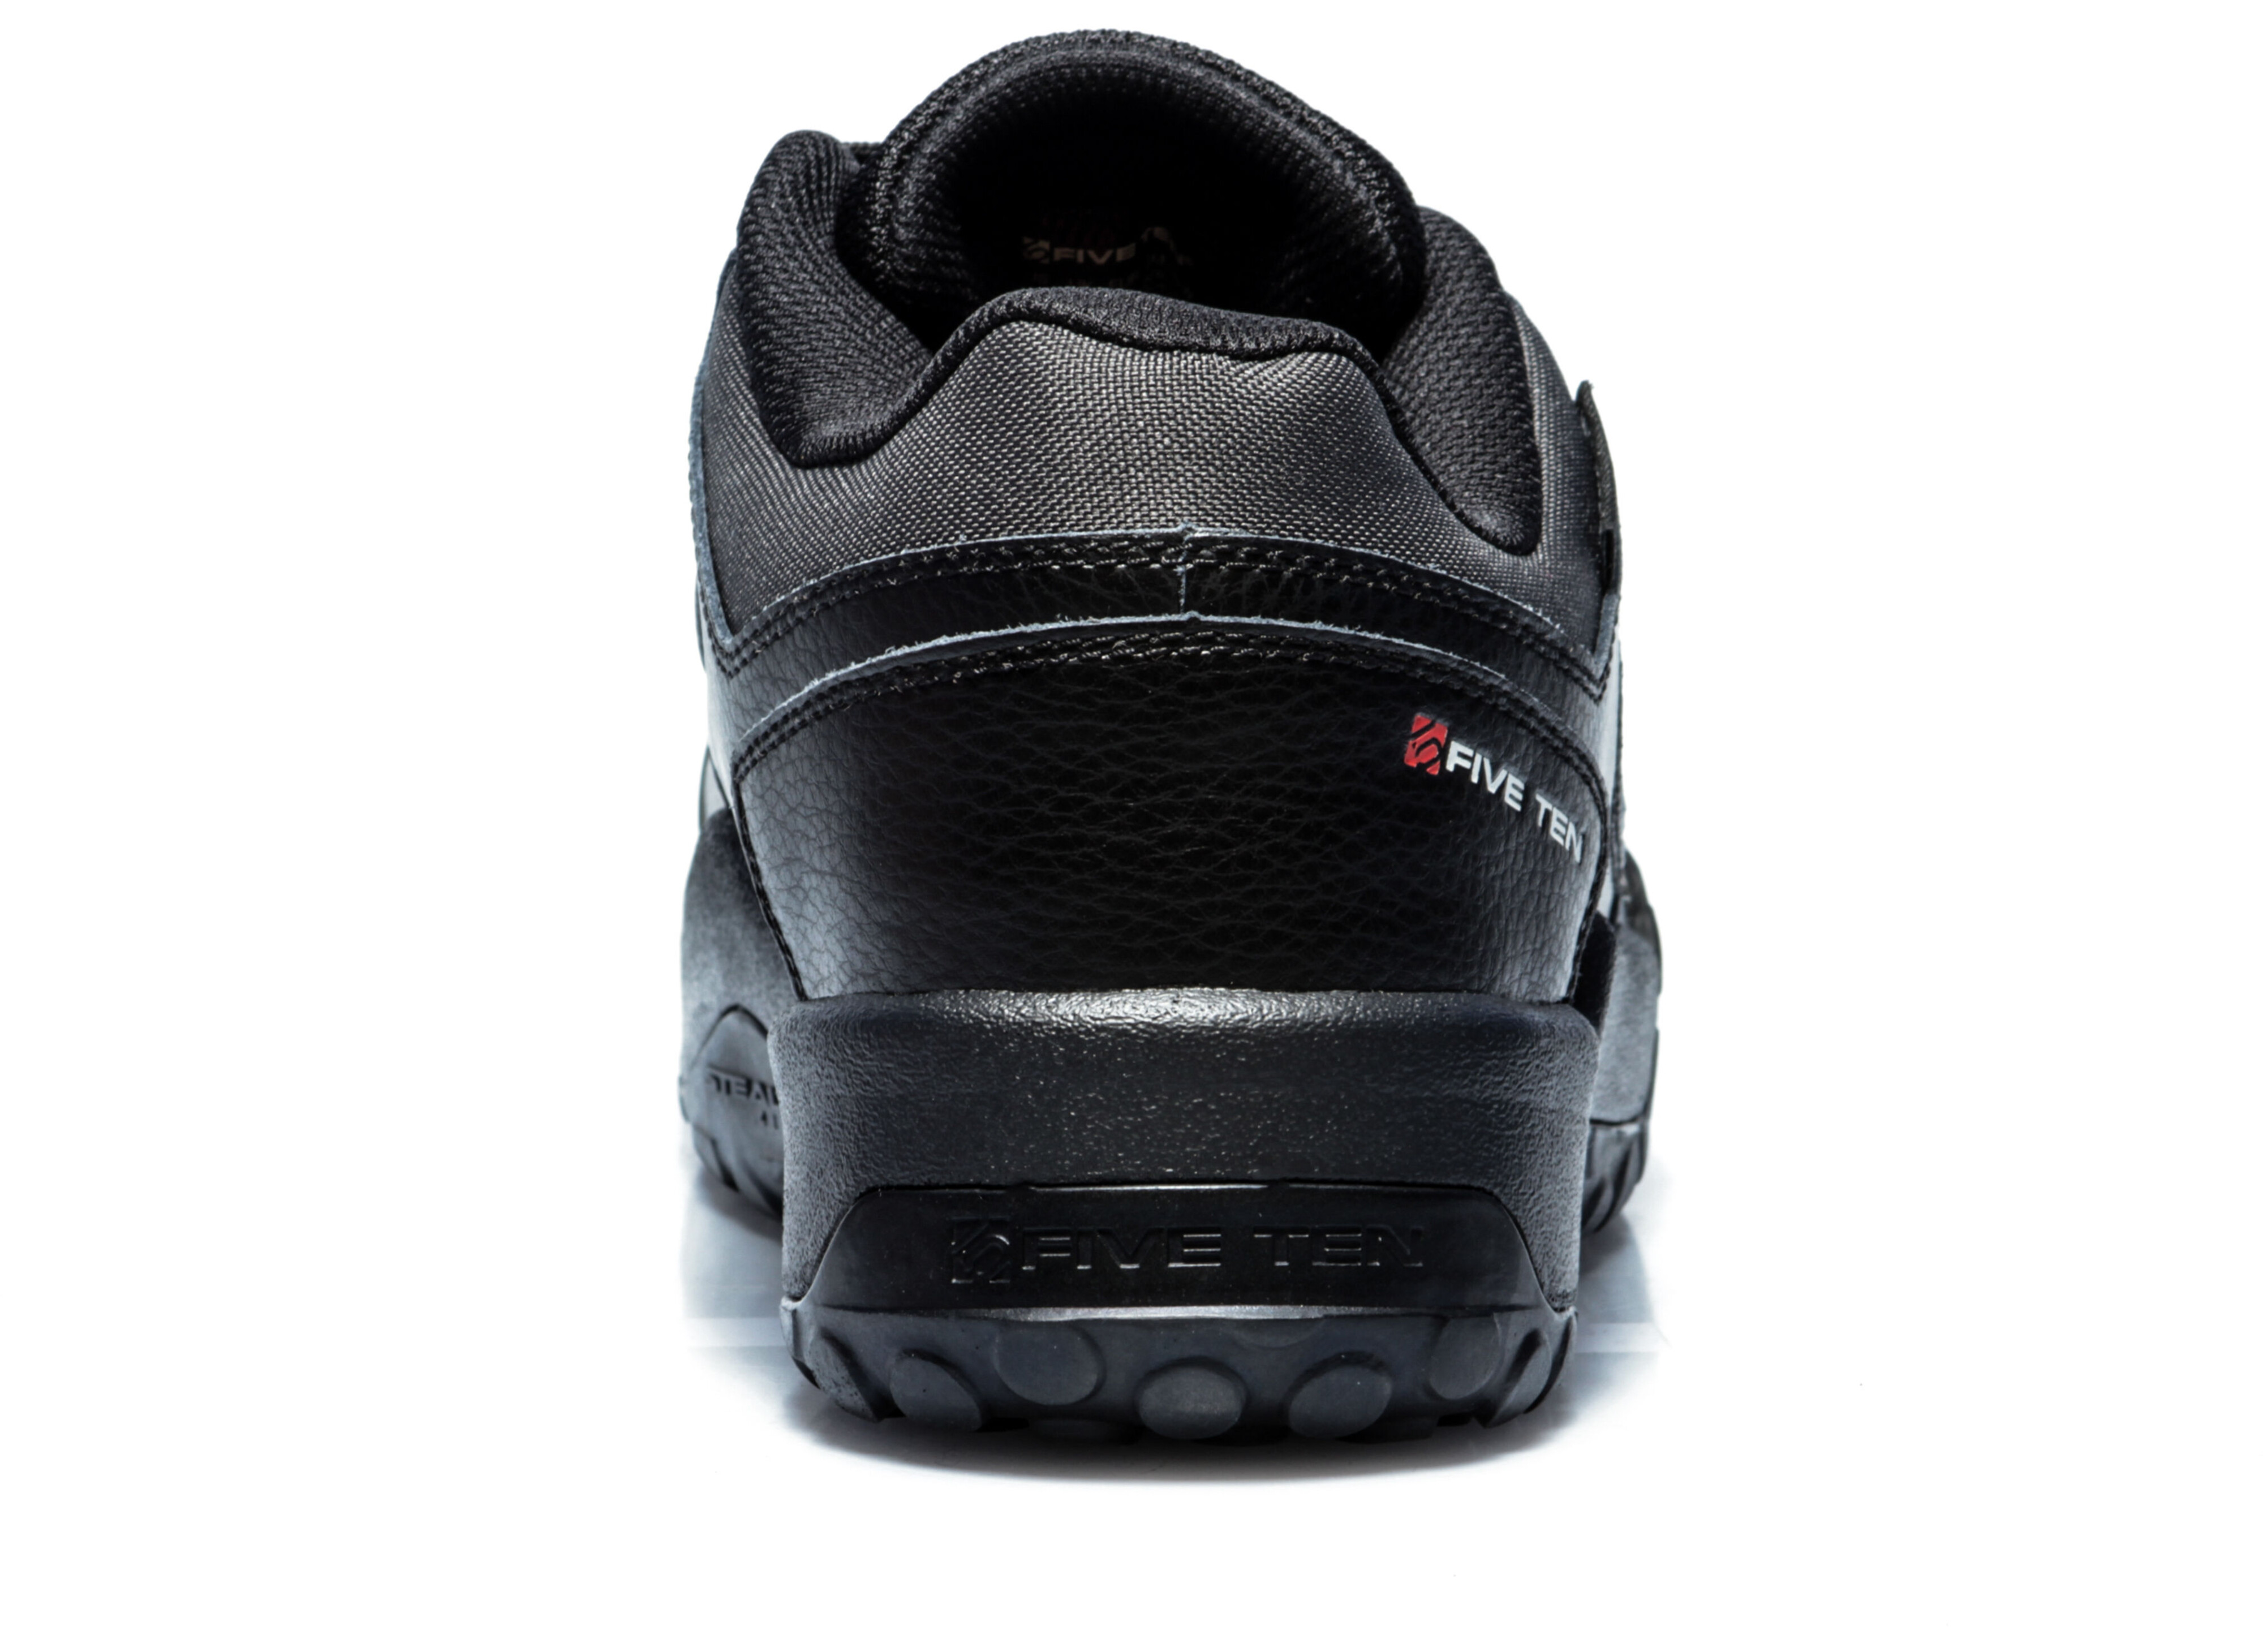 Five Ten Impact Low Mtb Shoes Black Red